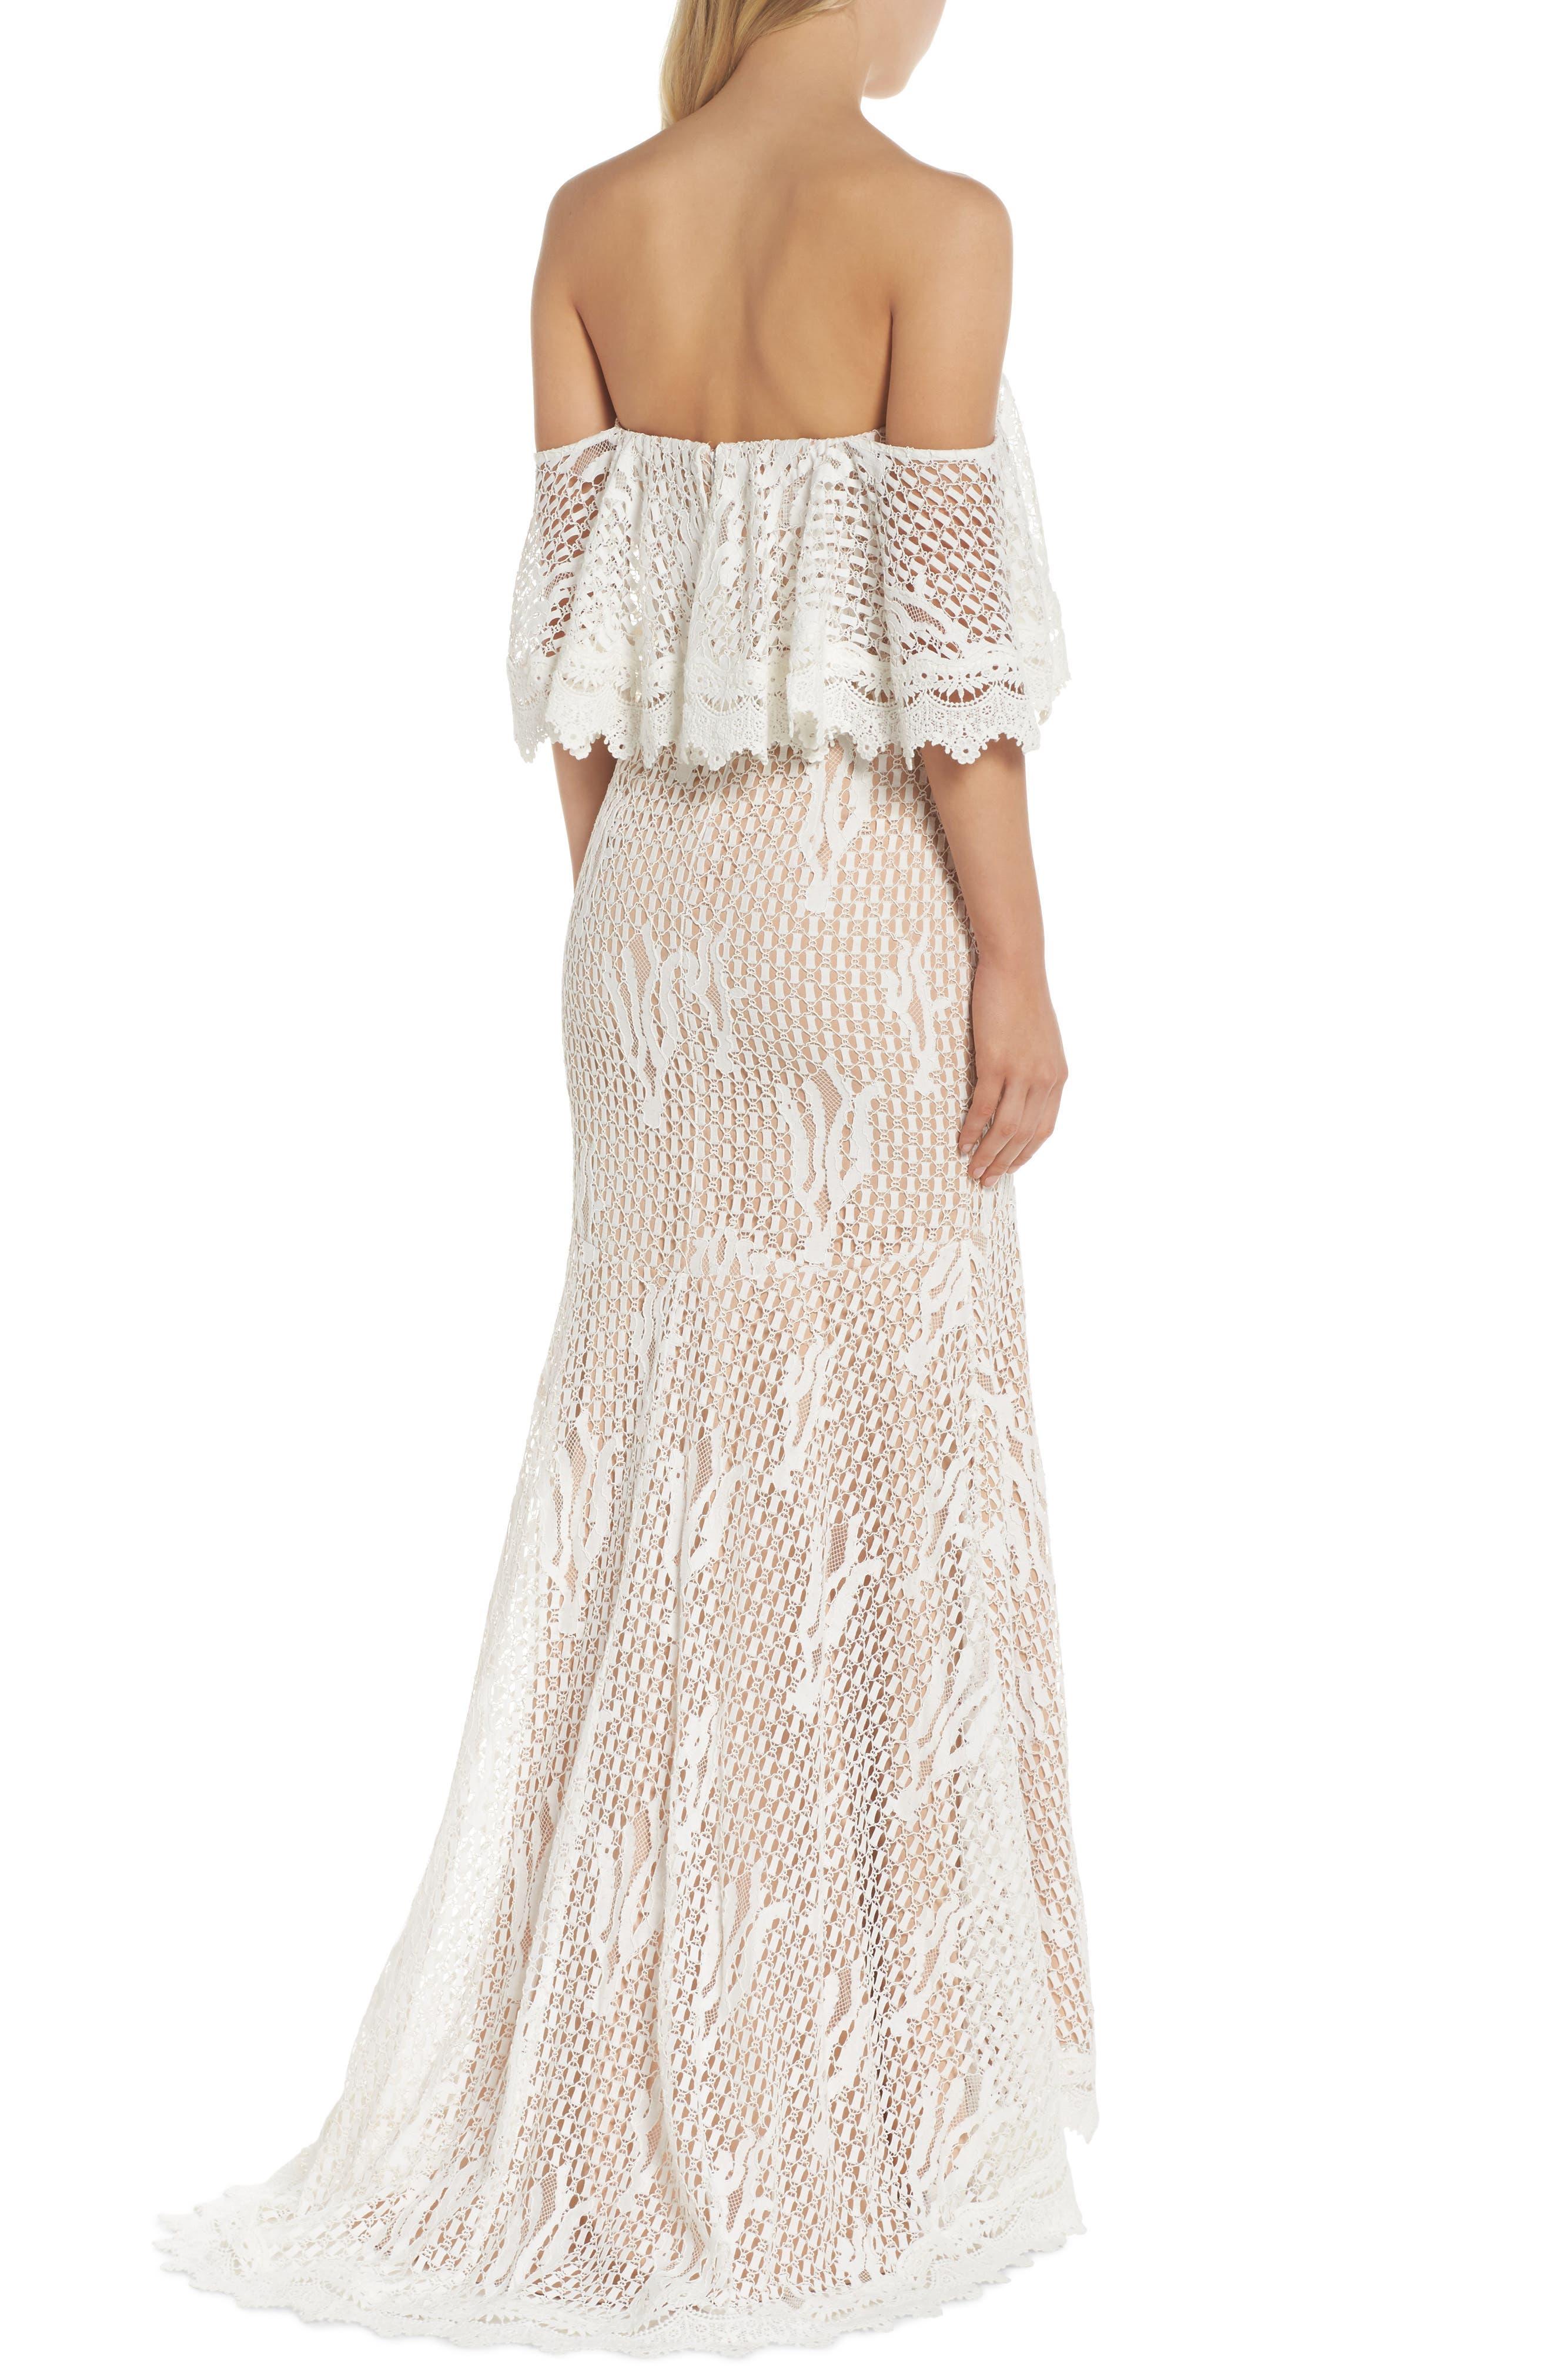 Davilea Off the Shoulder Lace Gown,                             Alternate thumbnail 2, color,                             Ivory